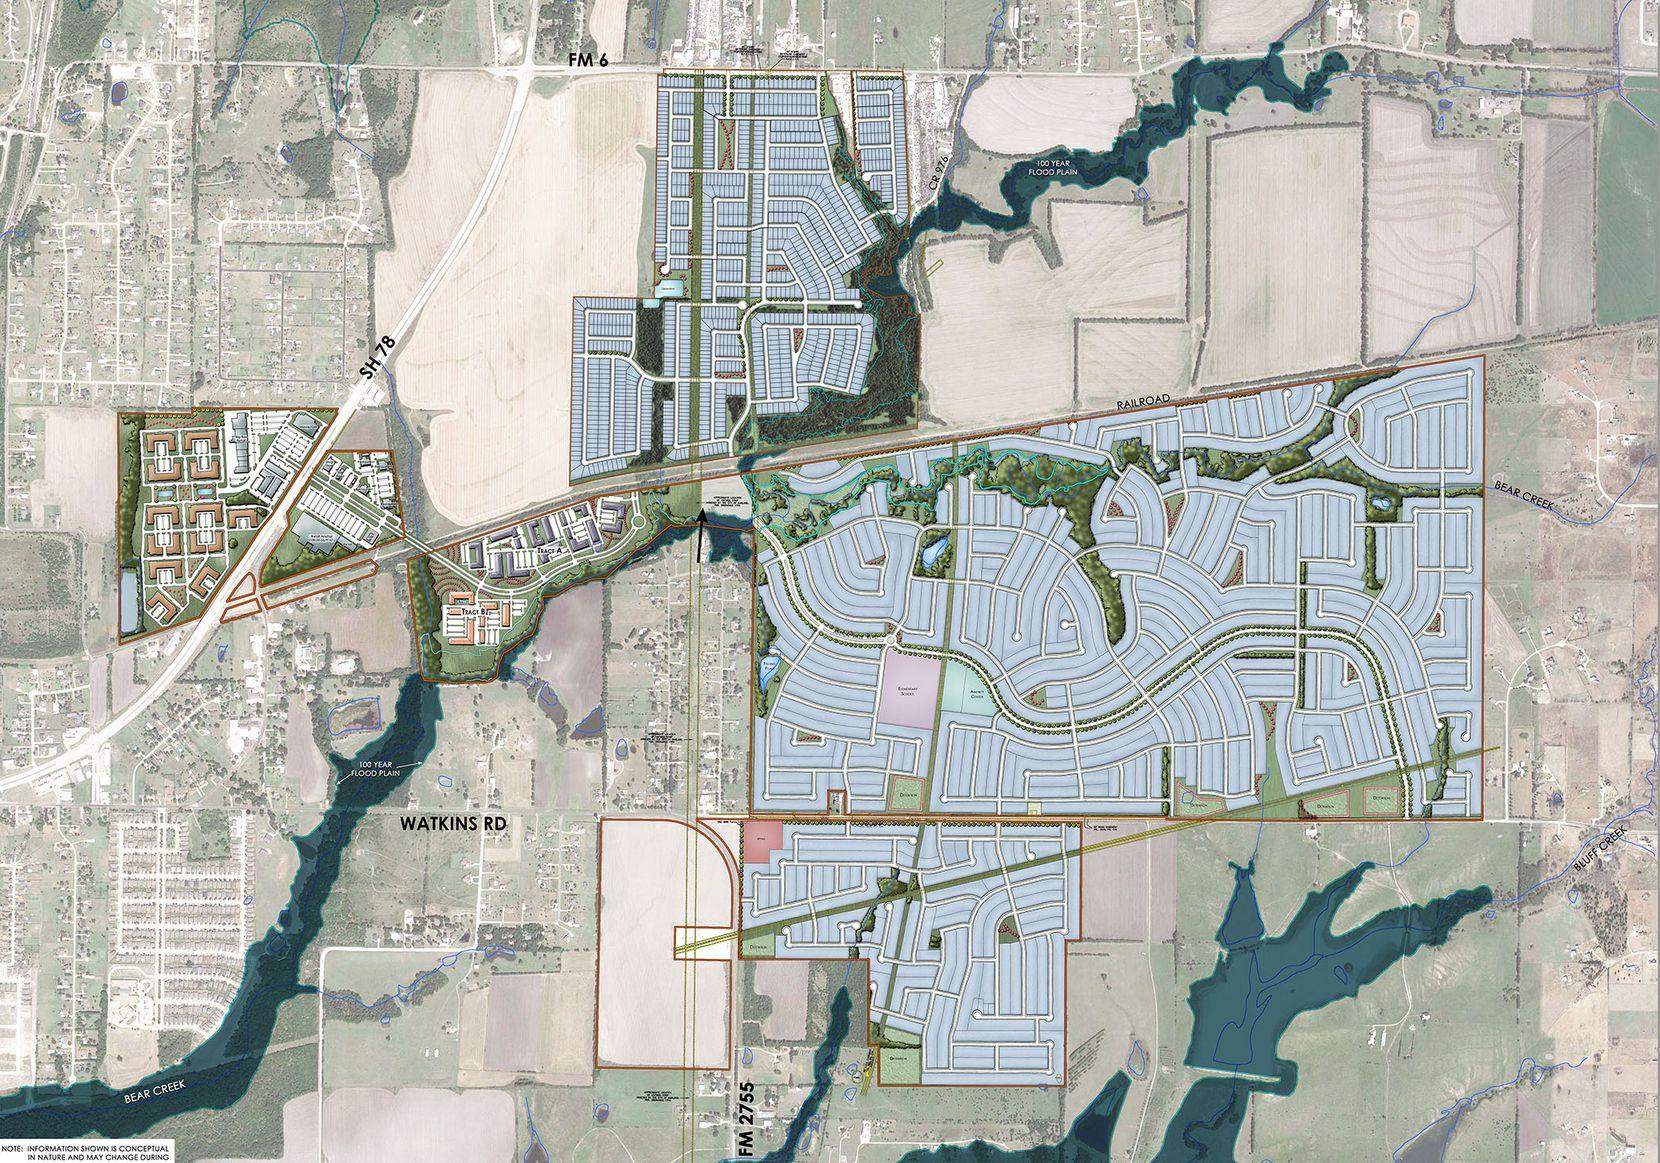 A conceptional plan for the $2 billion Elevon community in Lavon.